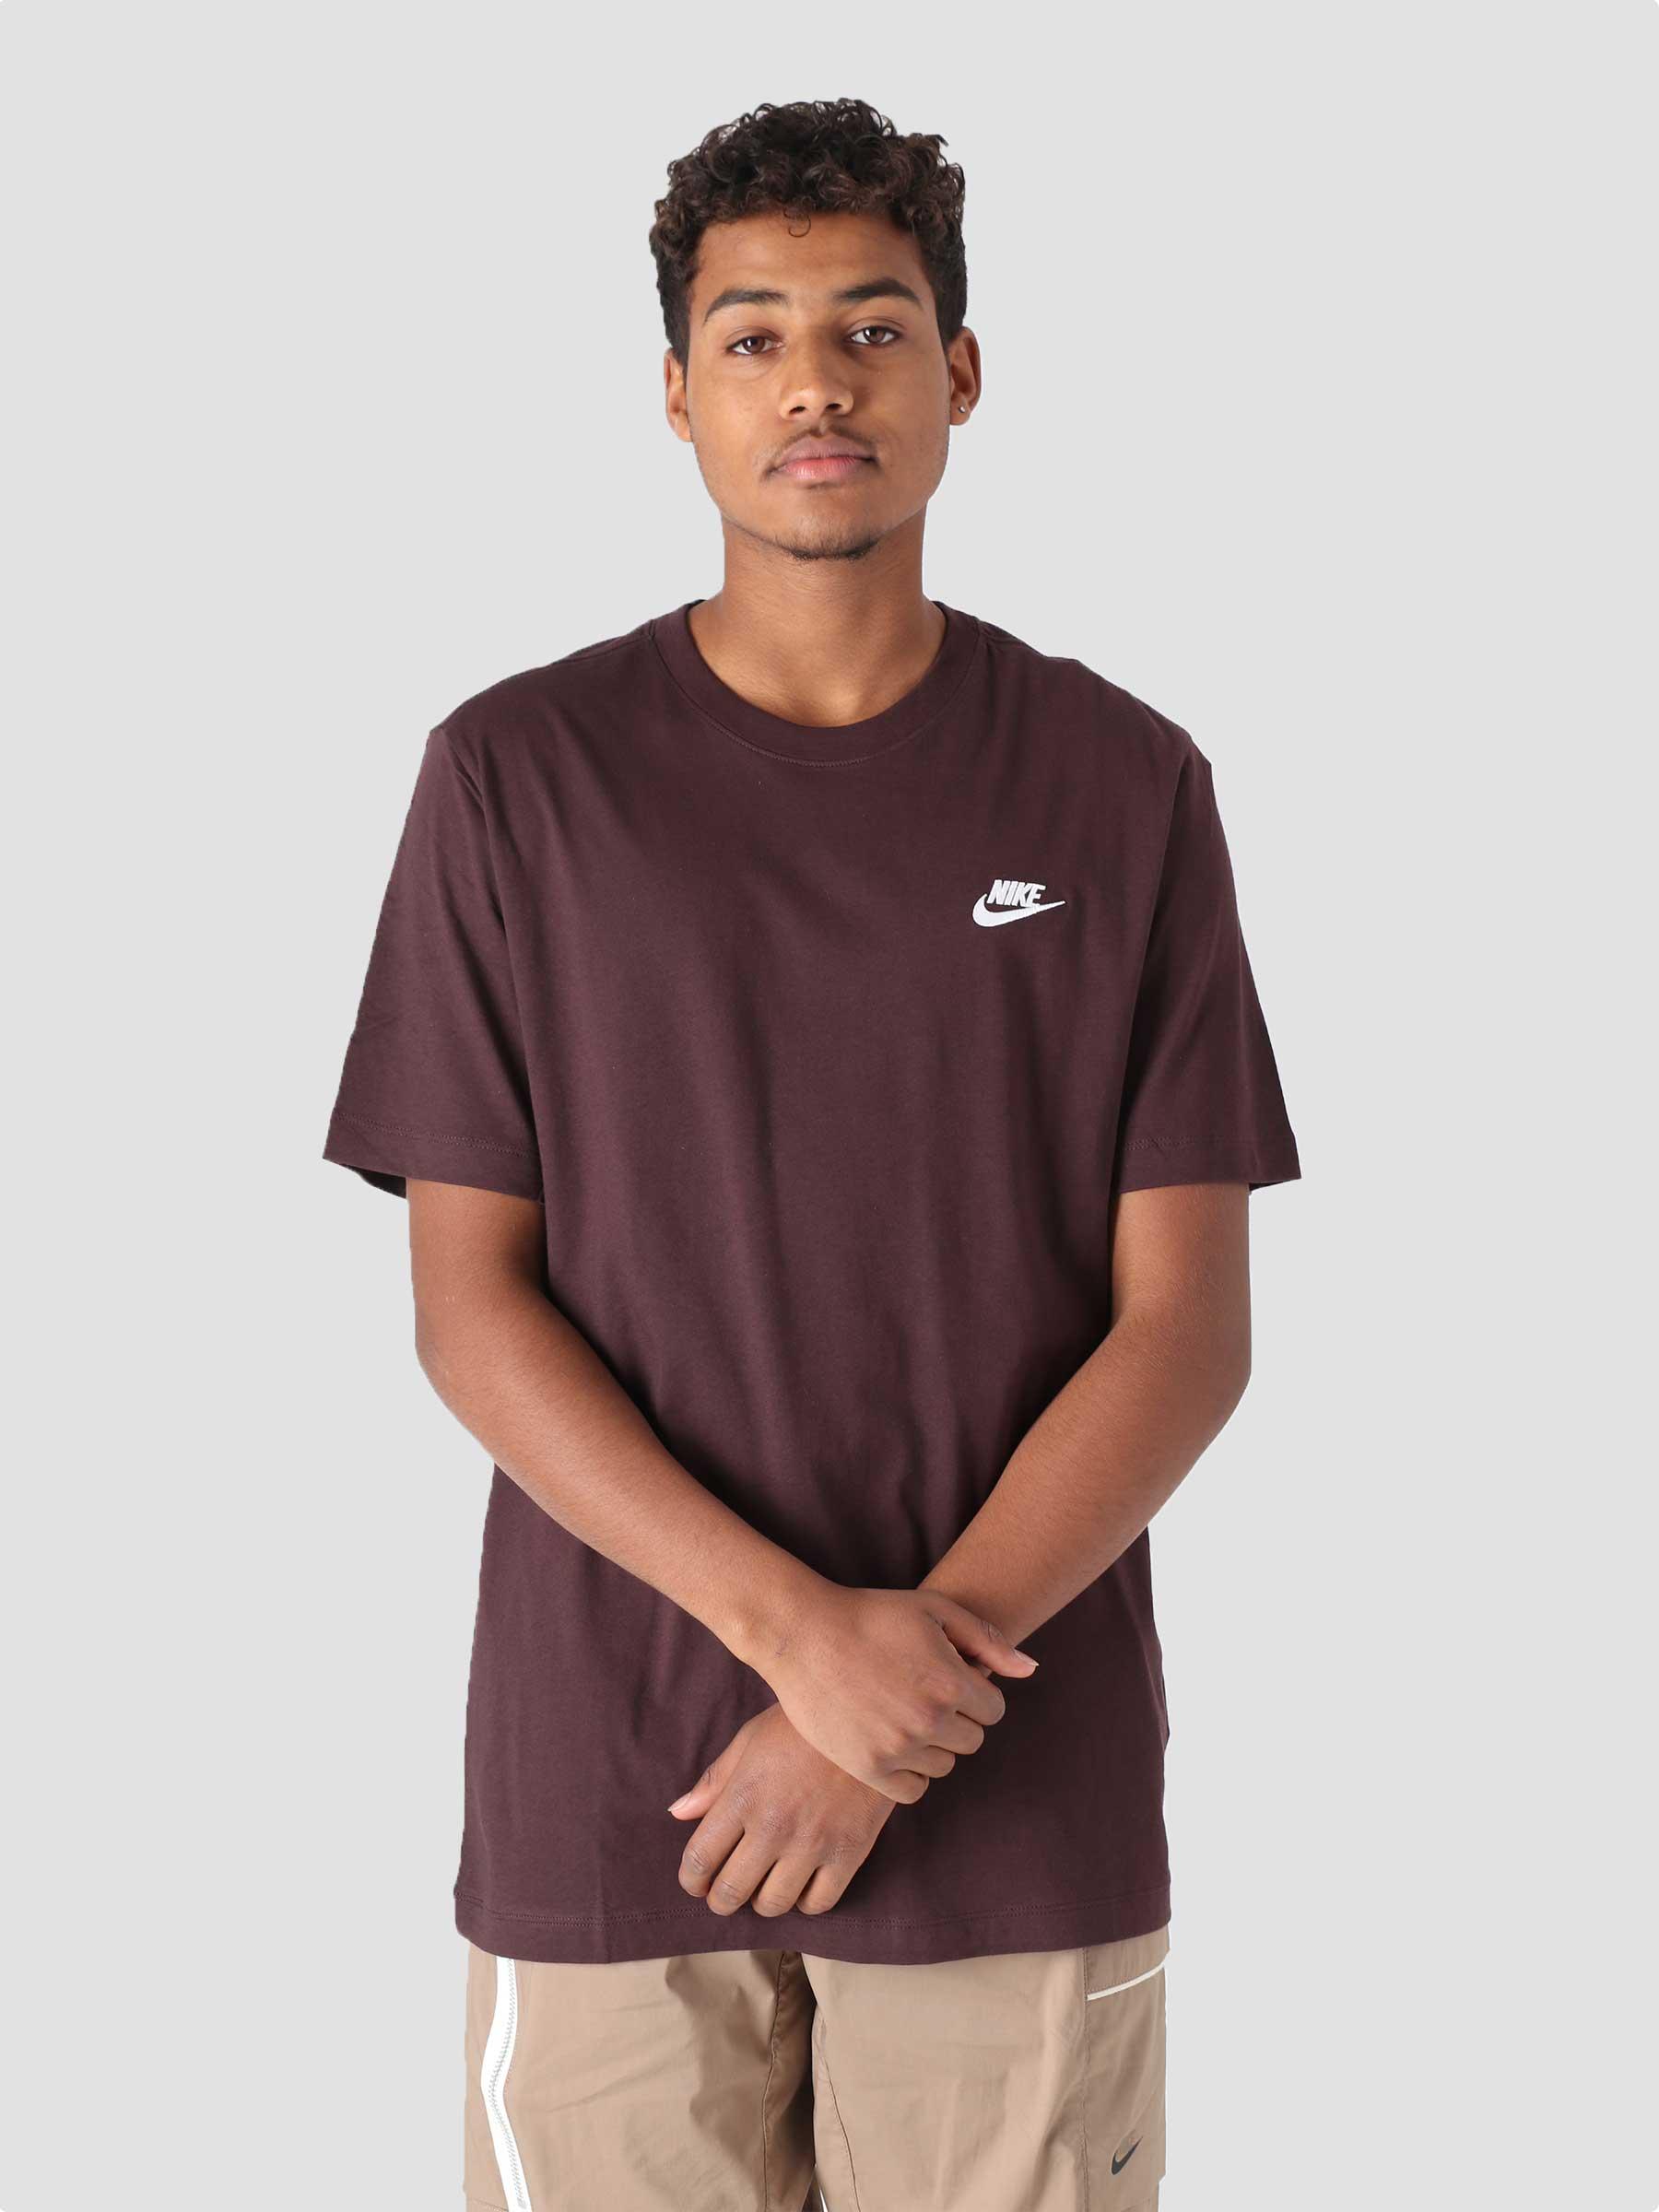 M NSW Club T-Shirt Brown Basalt White AR4997-203